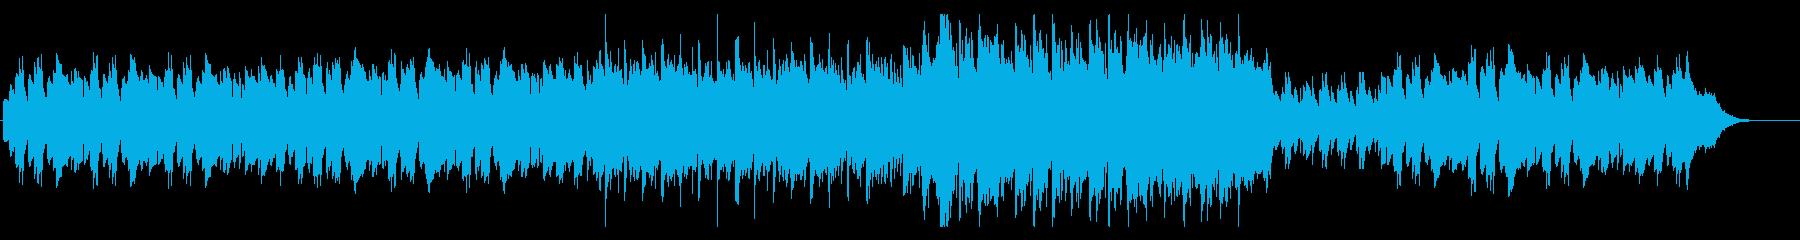 RPG森の遺跡イメージ・怪しげ・壮大の再生済みの波形